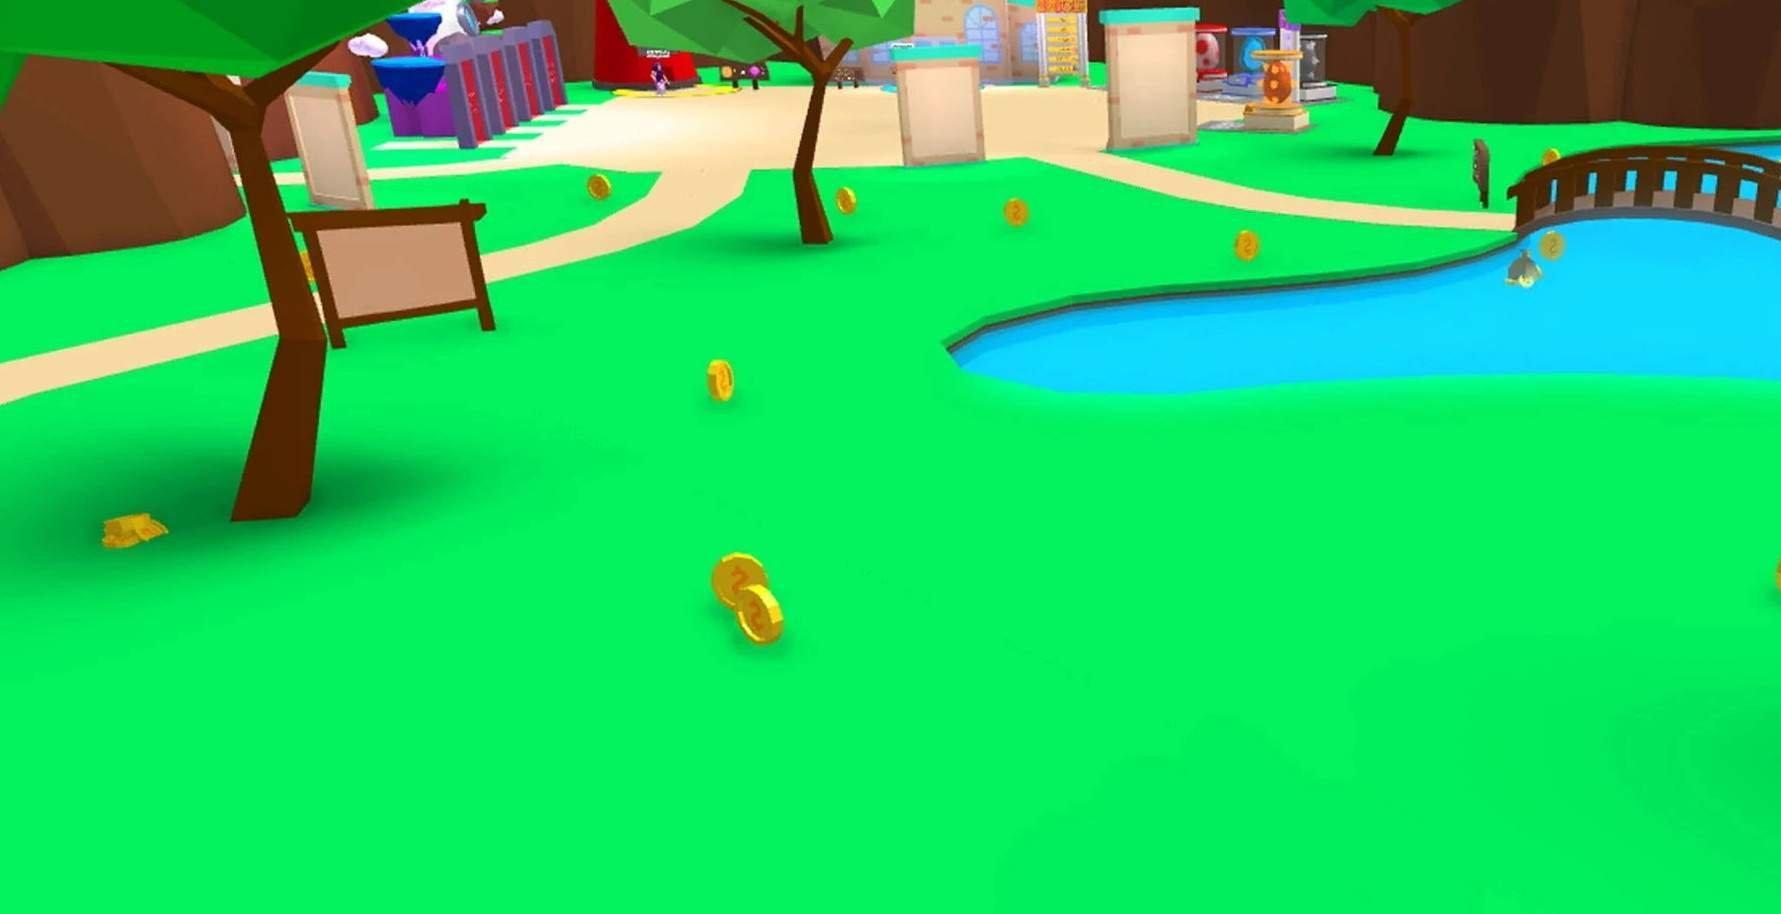 Roblox Egg Simulator Codes July 2020